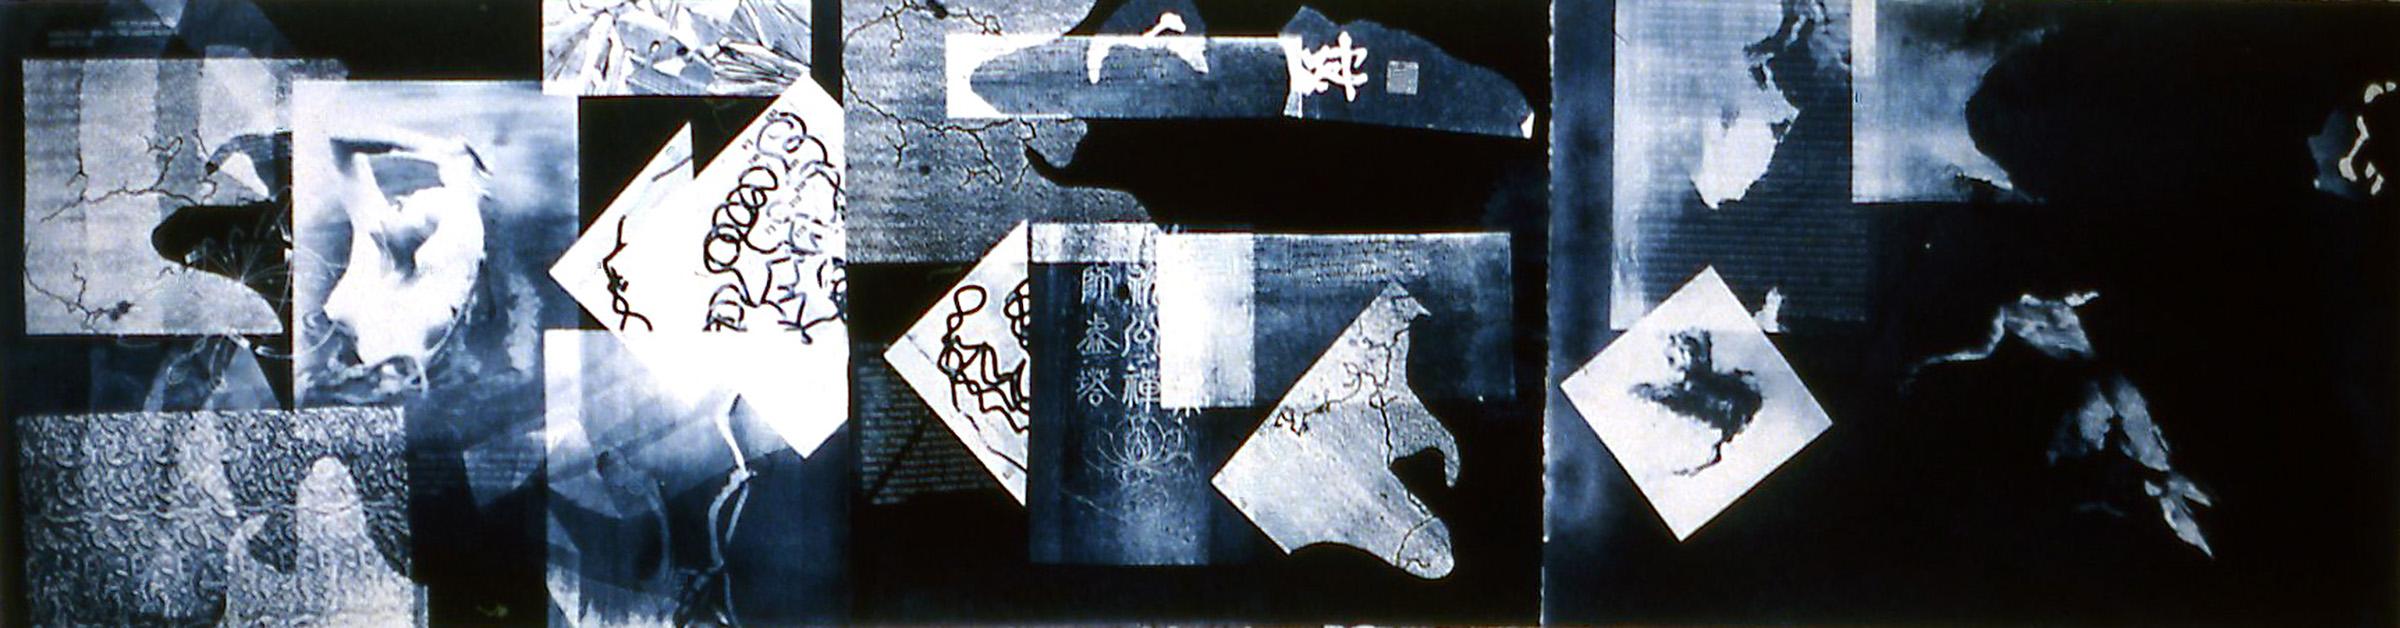 Imagine Traveling Counterclockwise, 1996, Cyanotype on paper, 17 x 65